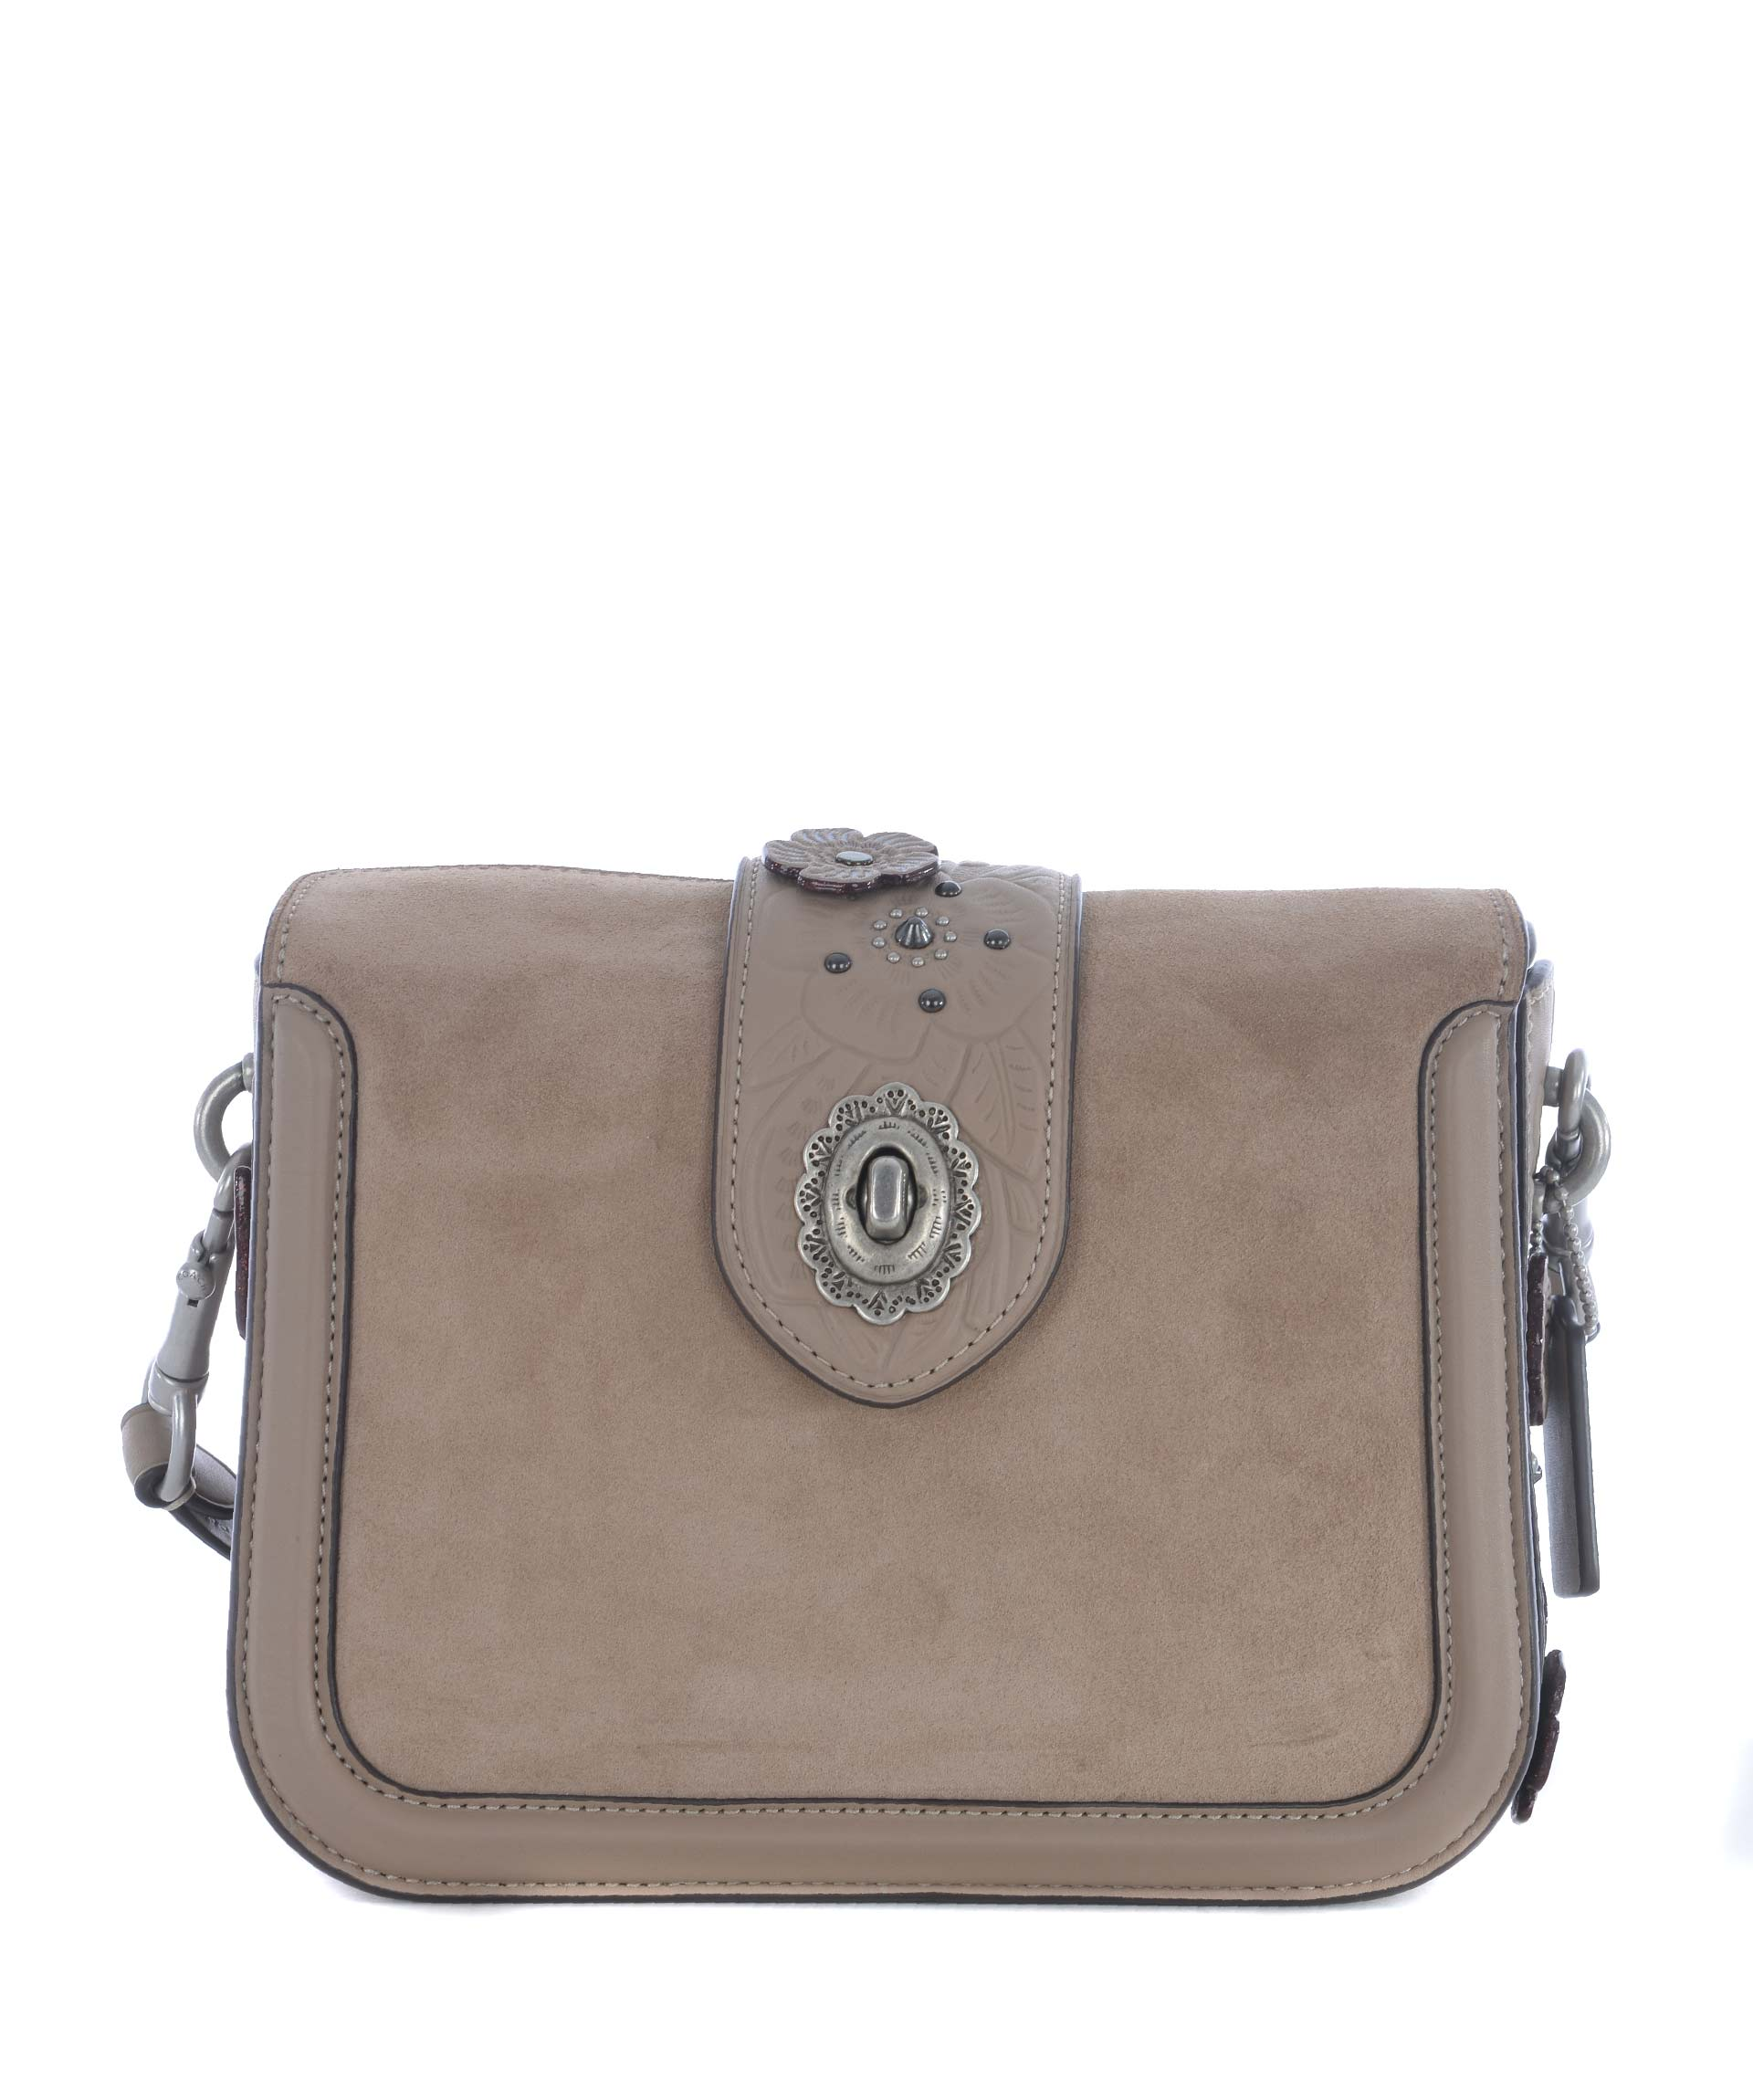 Coach Page Shoulder Bag